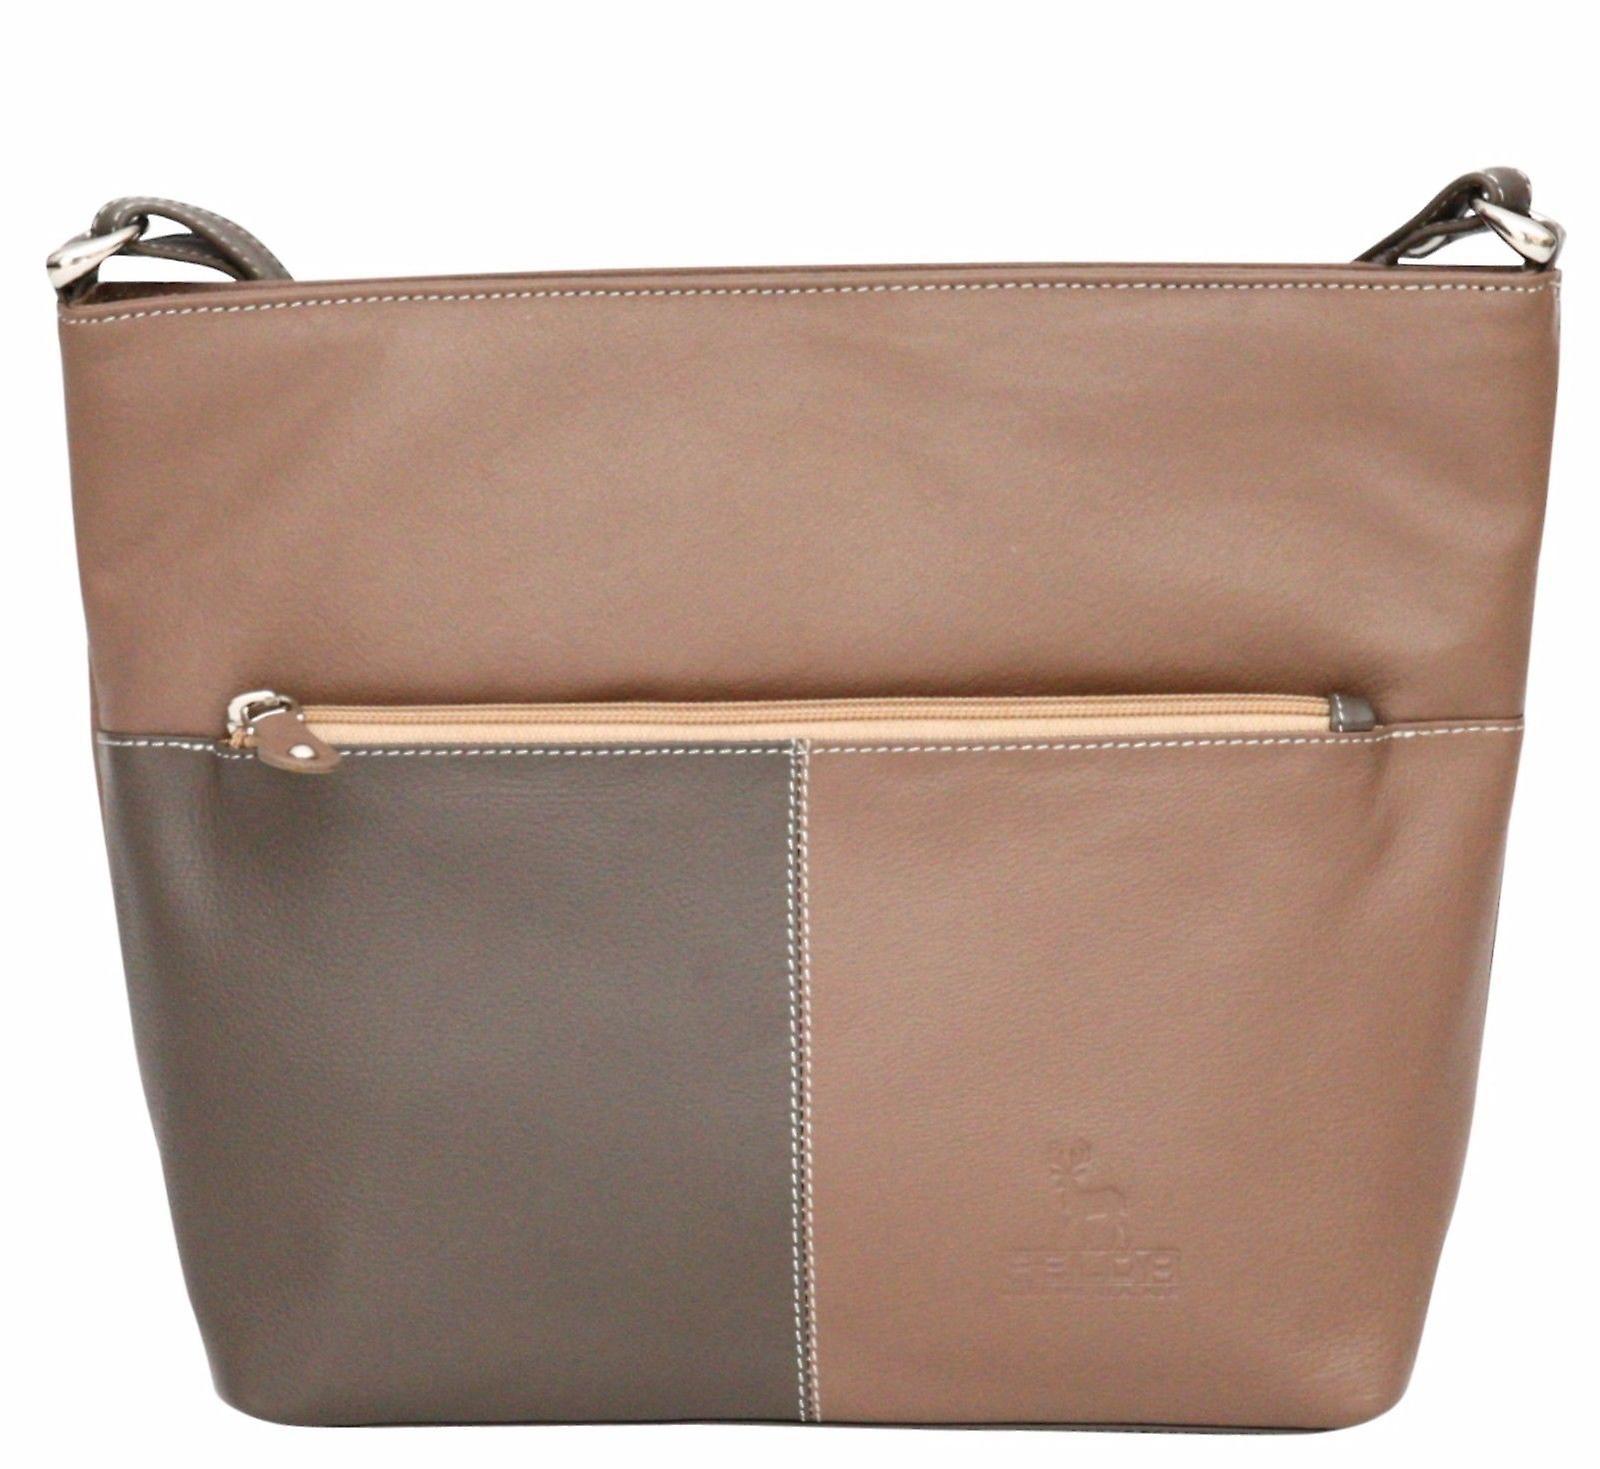 Luxury Genuine Real Leather Ladies Cross Body Handbag Tote Shoulder Shopper Bag